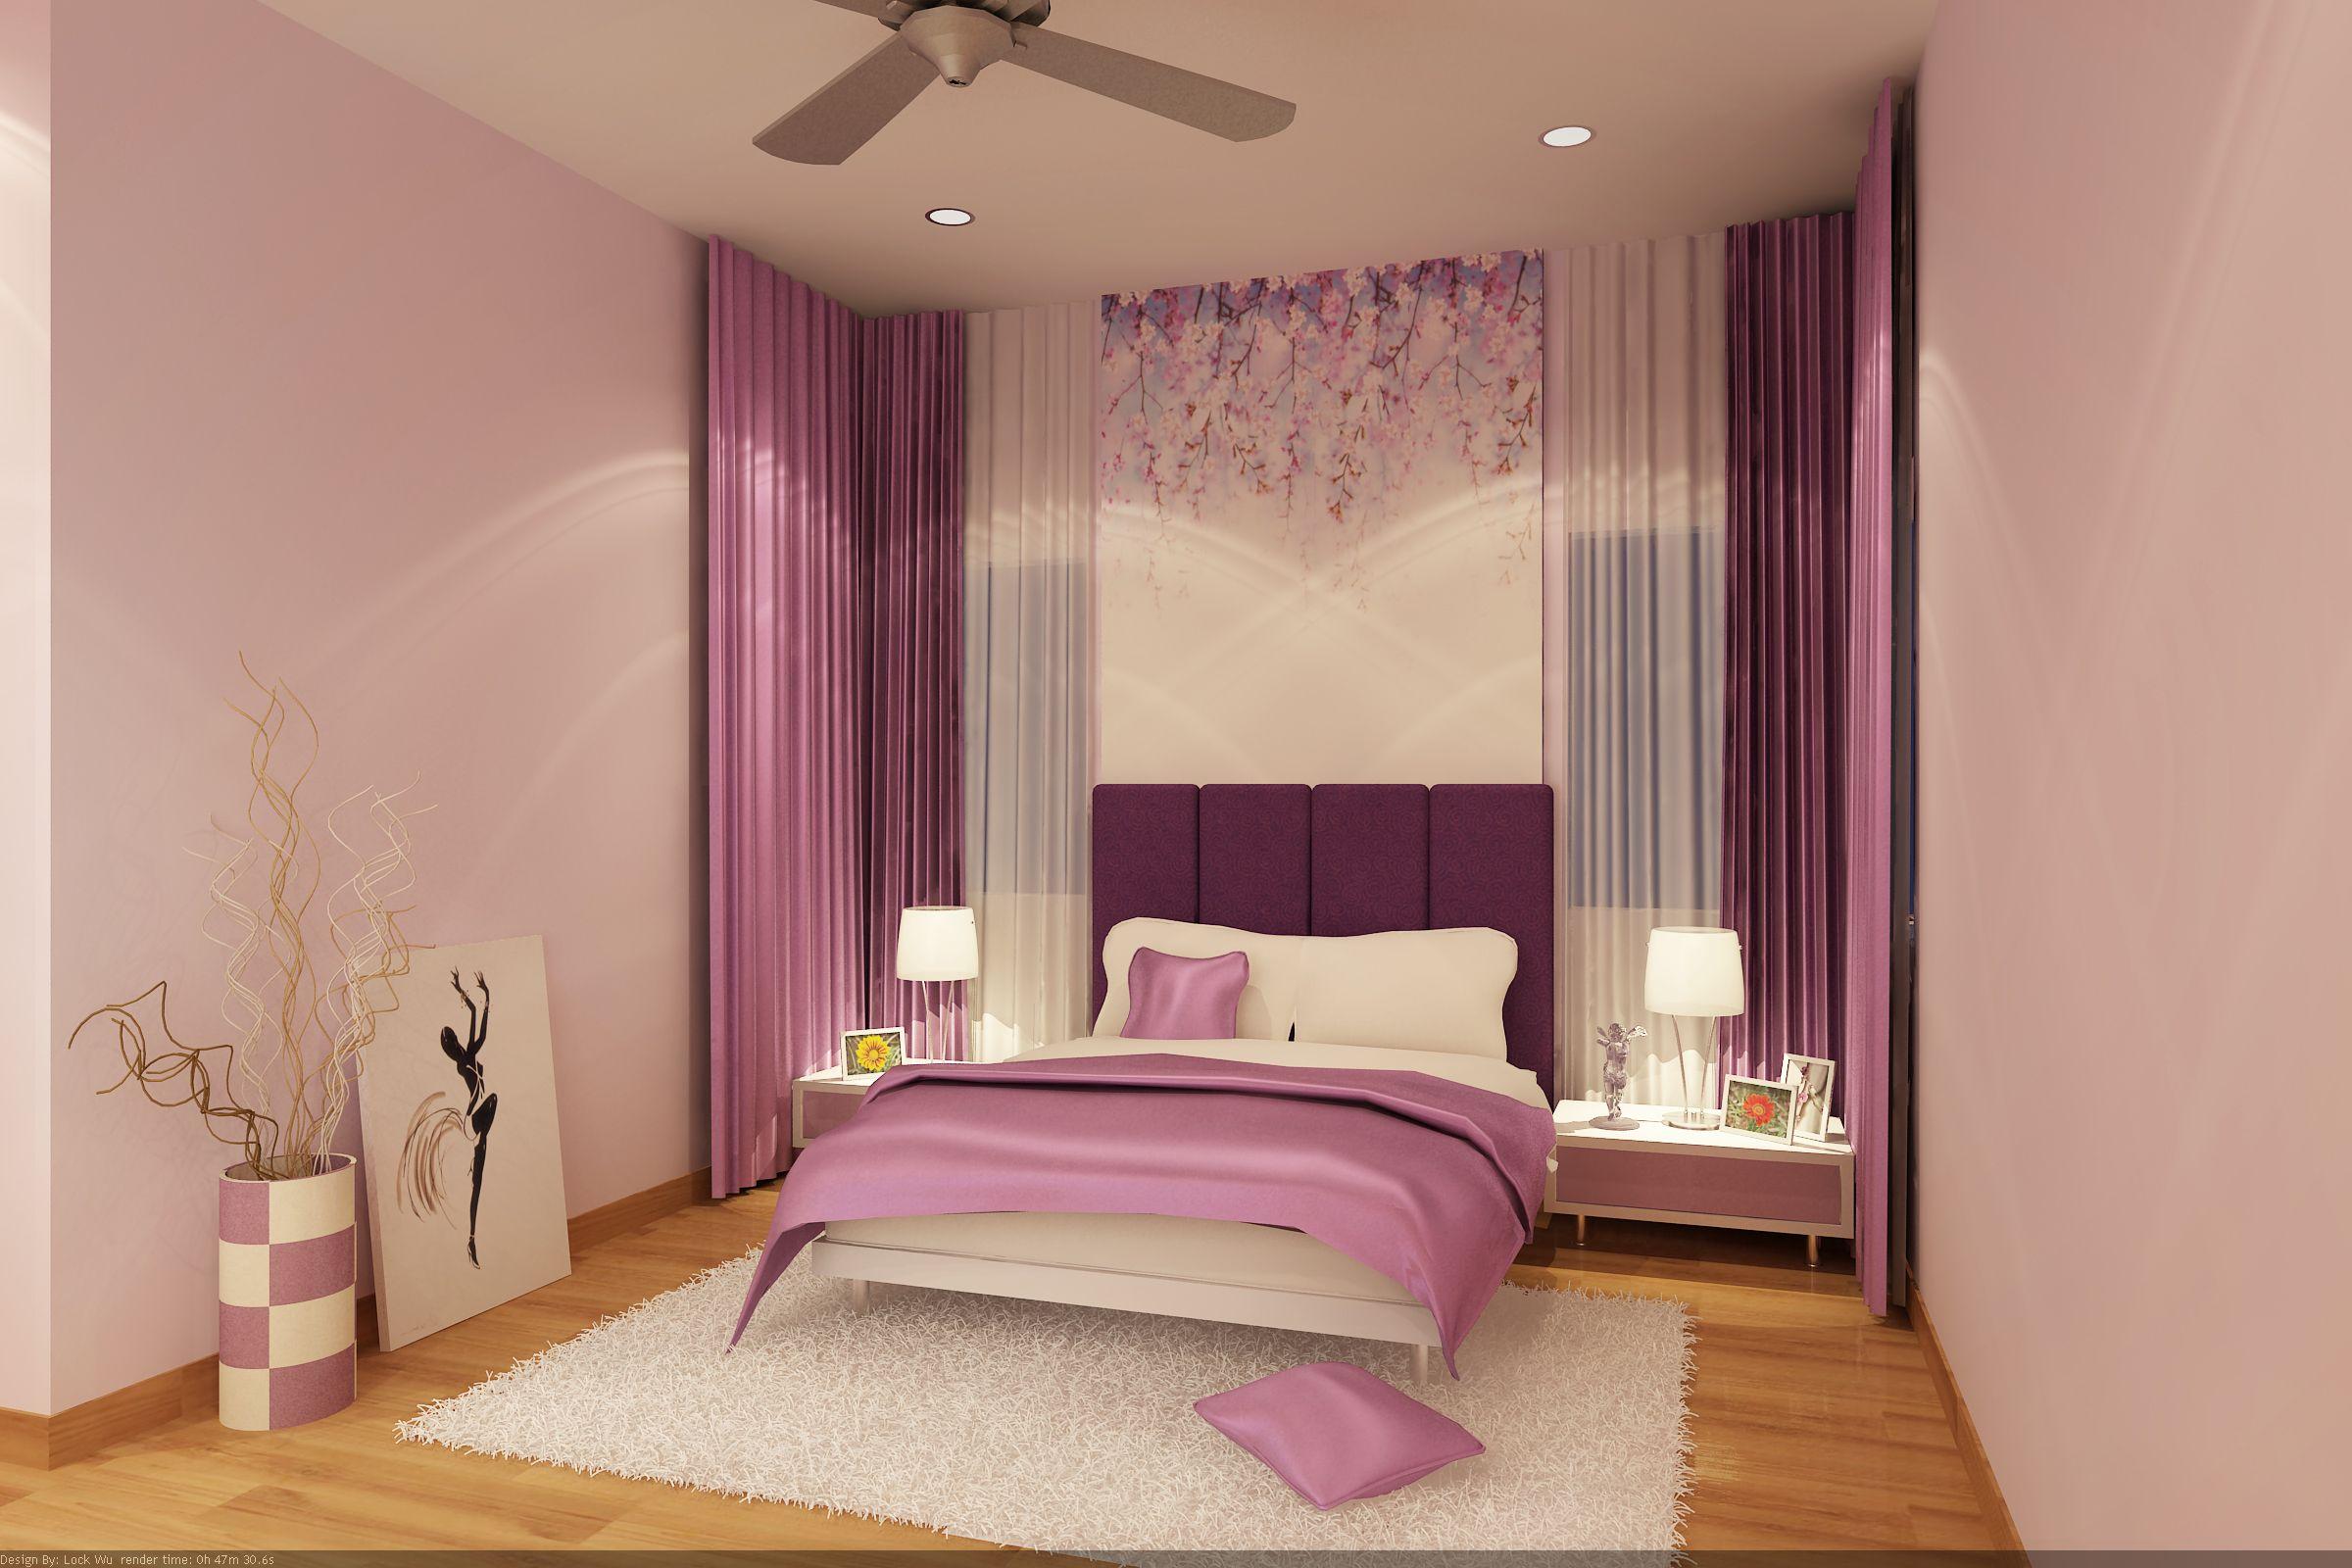 Bedroom Ideas For 13 Year Olds Woman Bedroom Cute Bedroom Ideas Girl Bedroom Decor